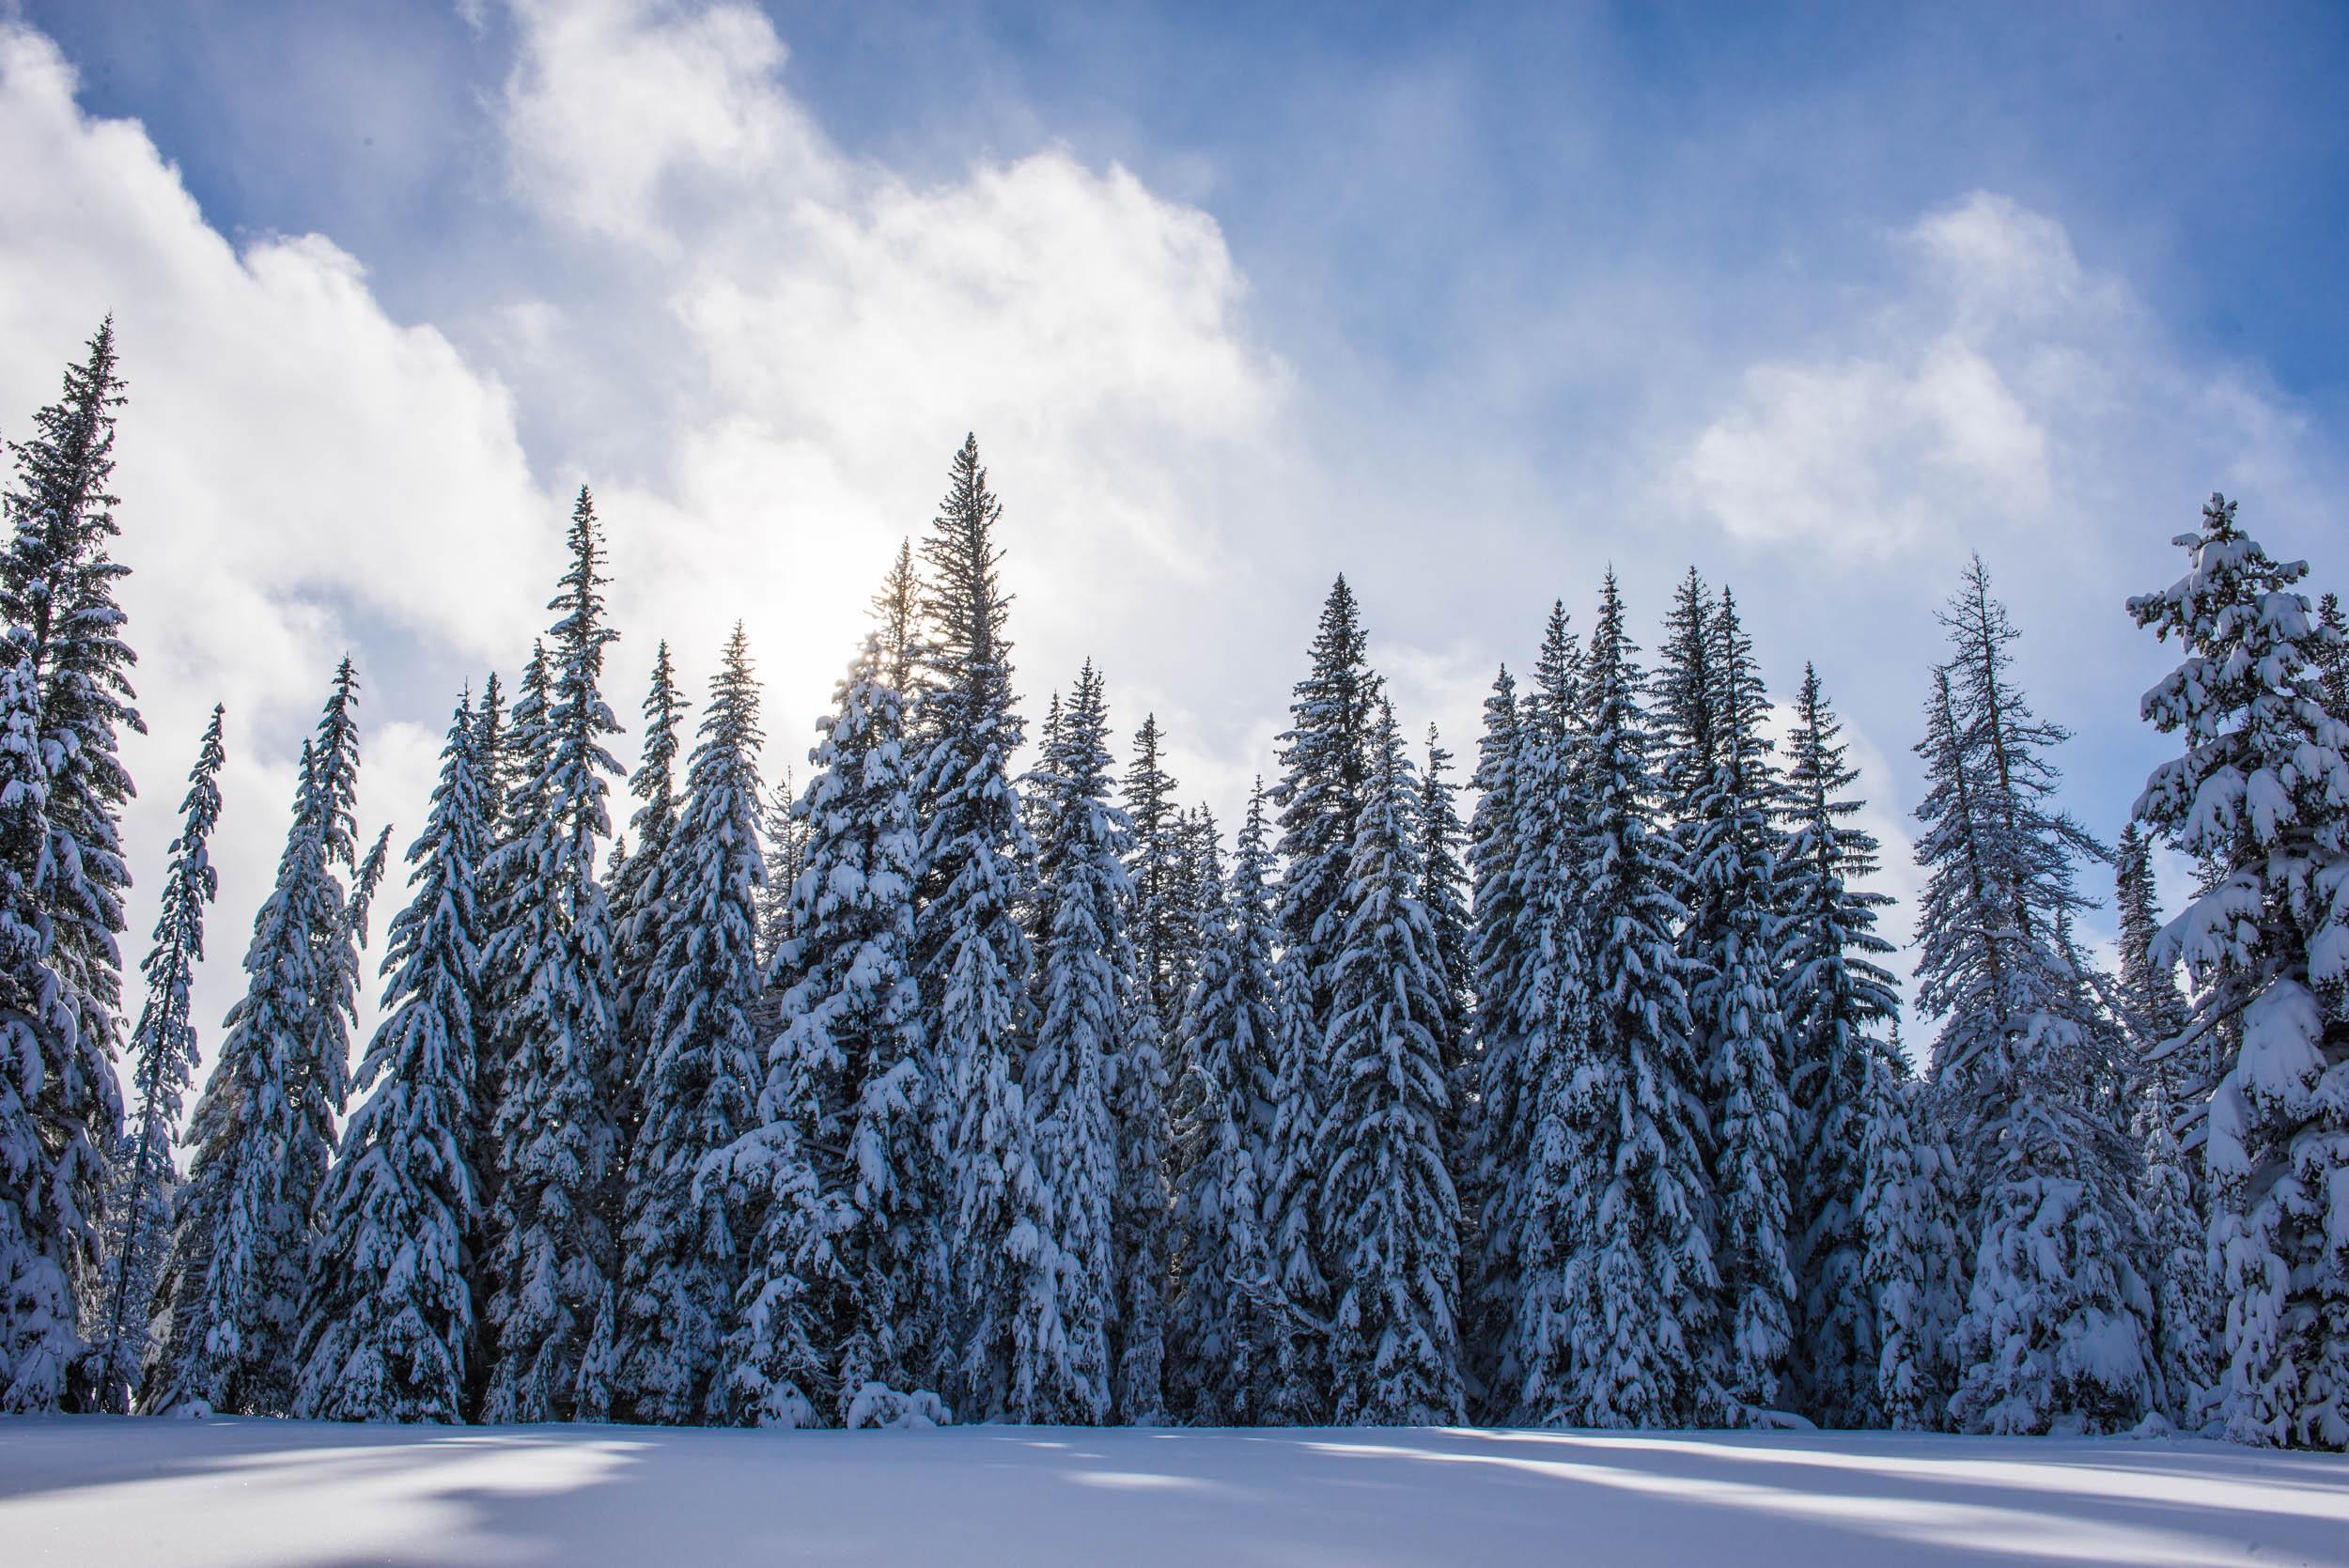 201512_0019_porcupine_trail_snowshoe.jpg